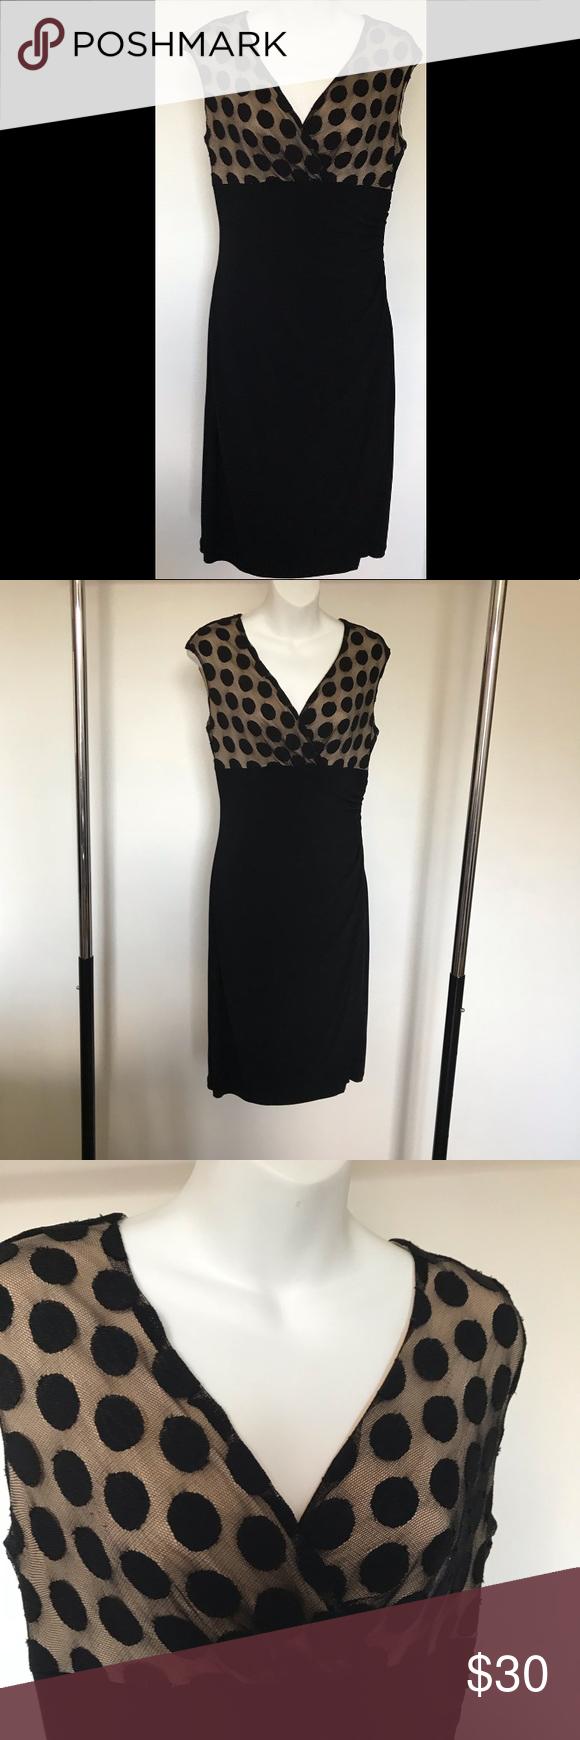 Ronni Nicole Black Sleeveless Dress Ronni Nicole Black Sleeveless Dress With Sheer Top Ronni Nicole Dresses Black Sleeveless Dress Dresses Sleeveless Dress [ 1740 x 580 Pixel ]